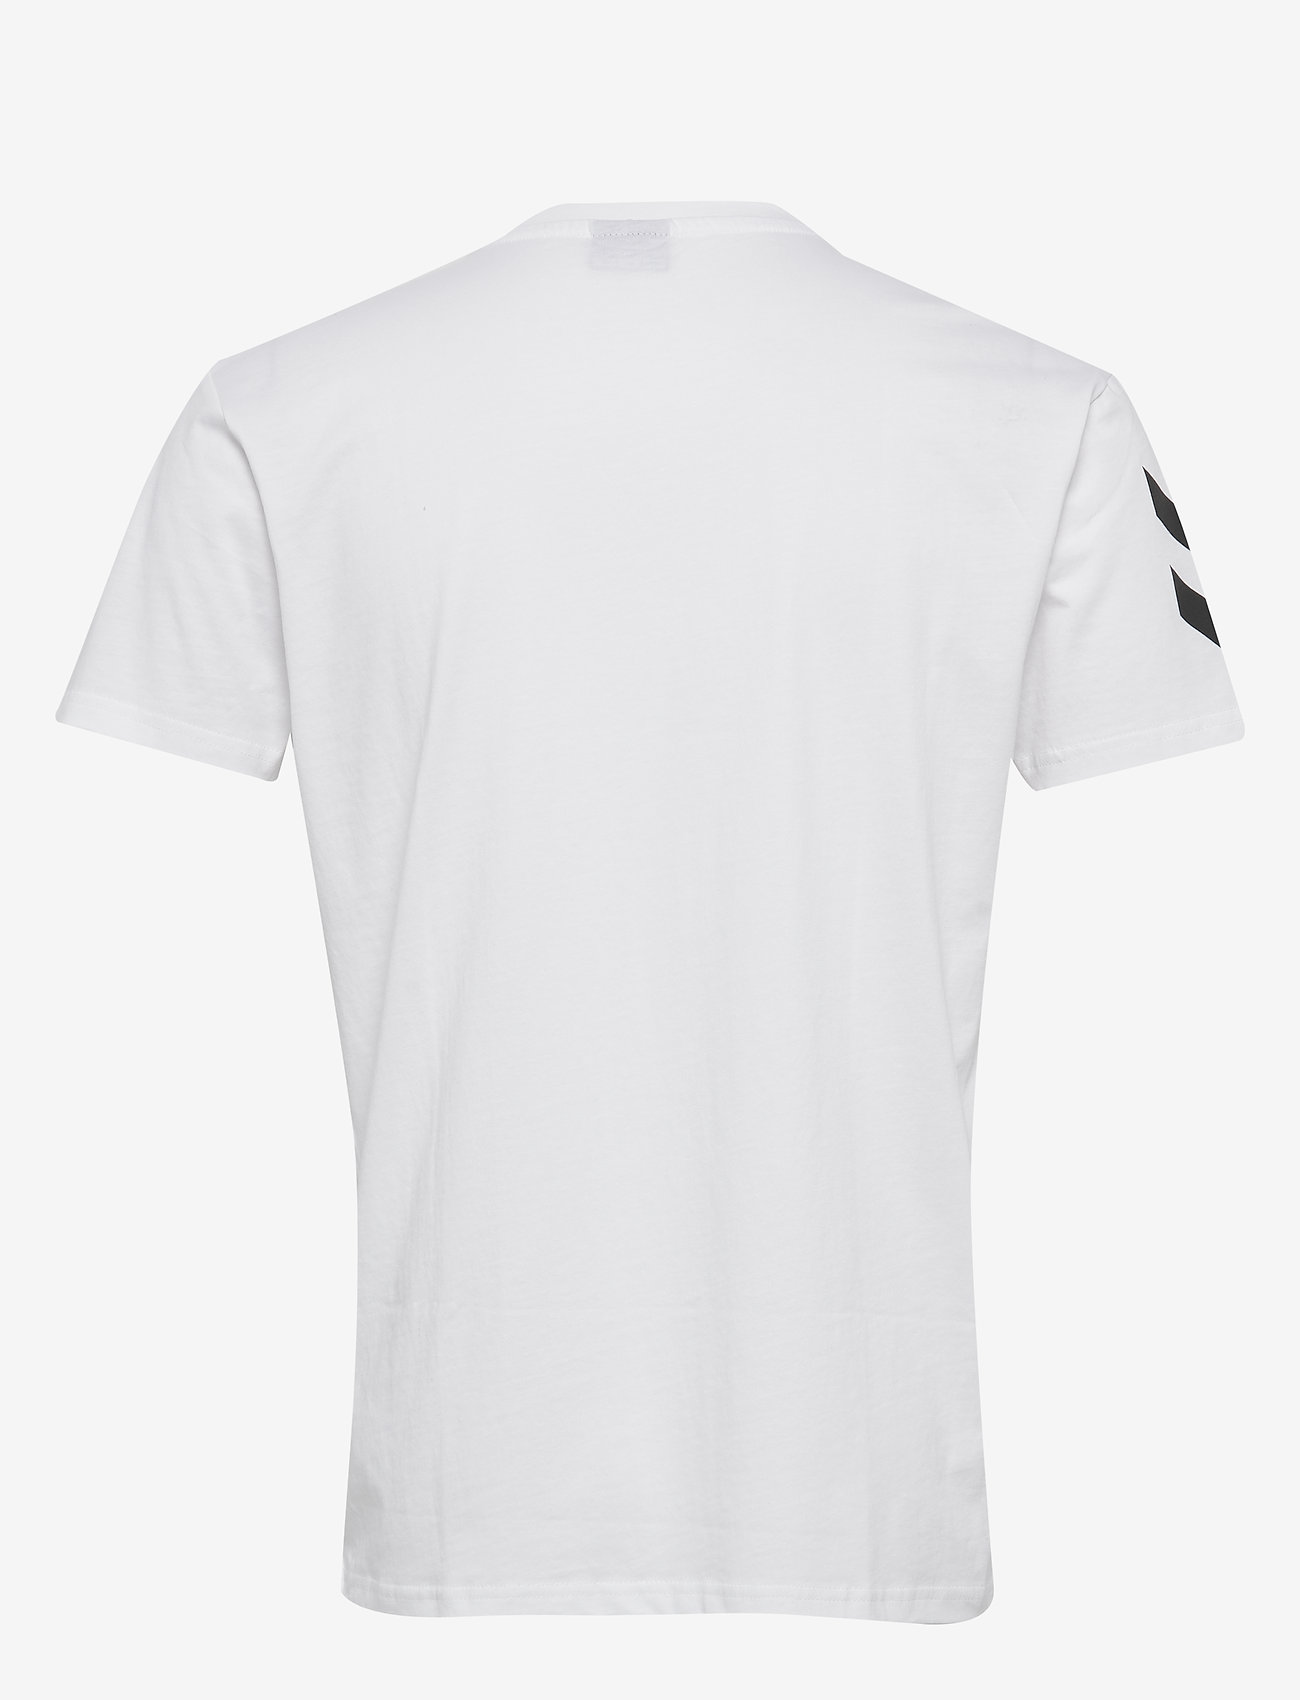 Hummel - HMLGO COTTON T-SHIRT S/S - t-shirts - white - 1